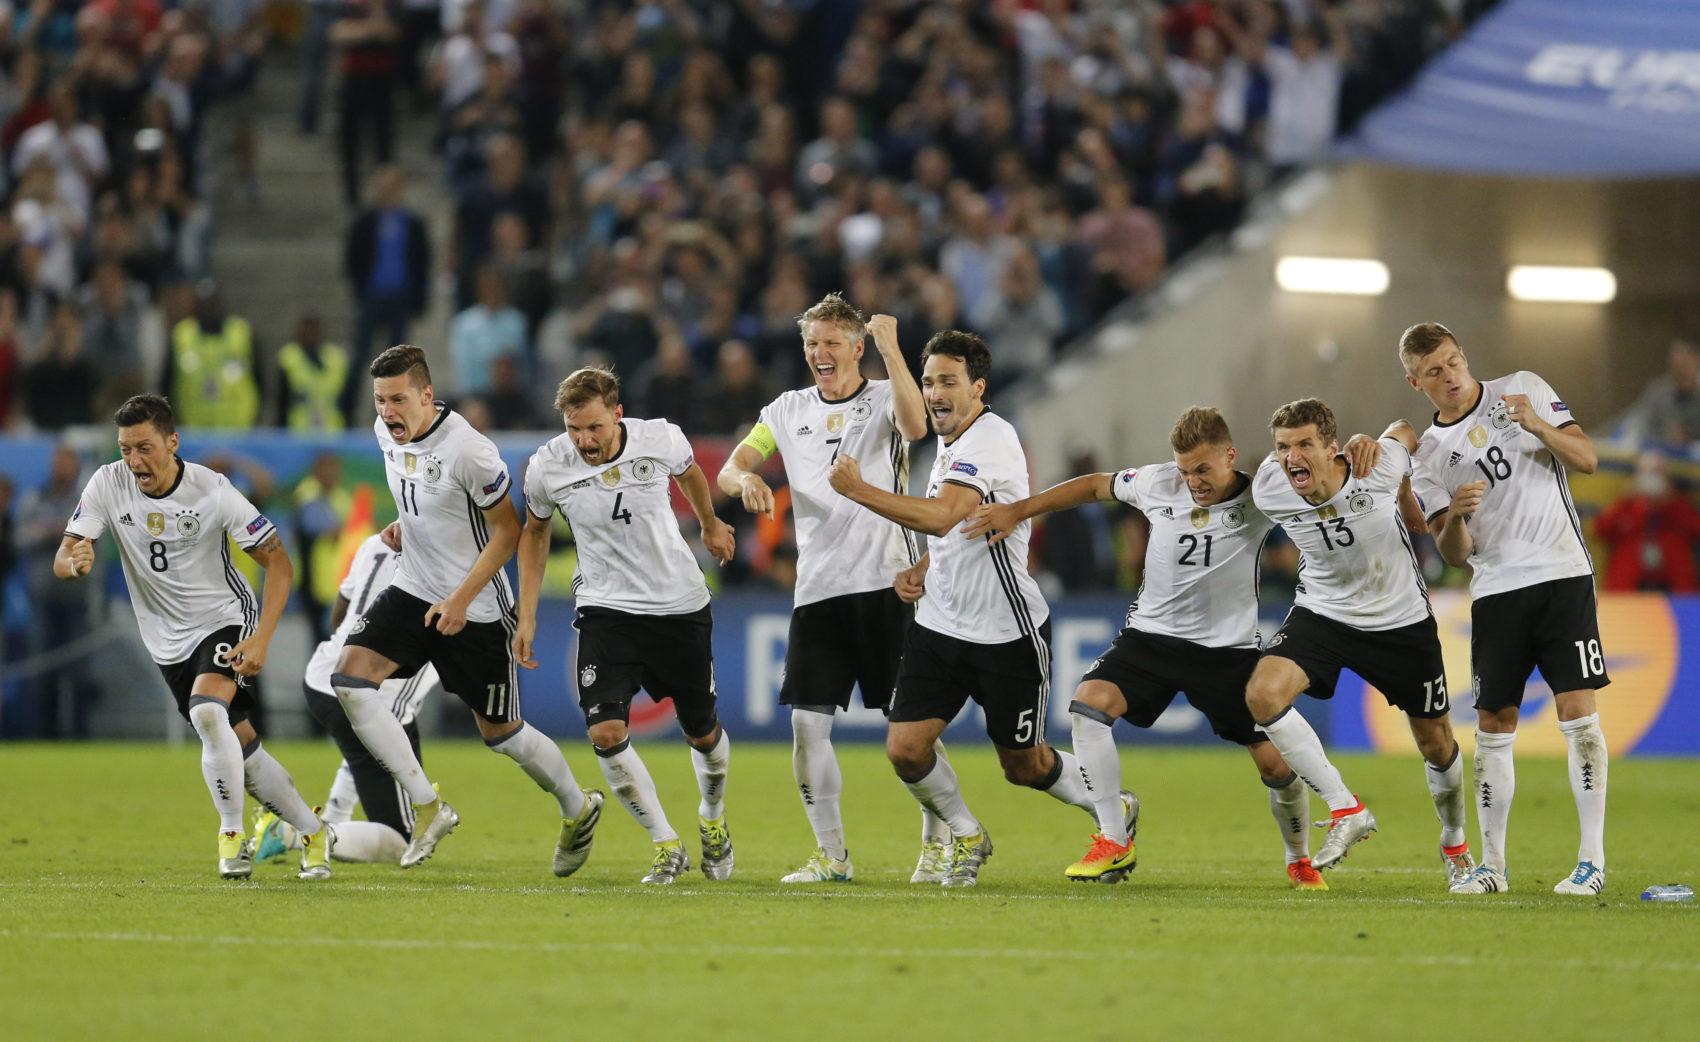 Nemecko – Francúzsko, semifinále EURO 2016